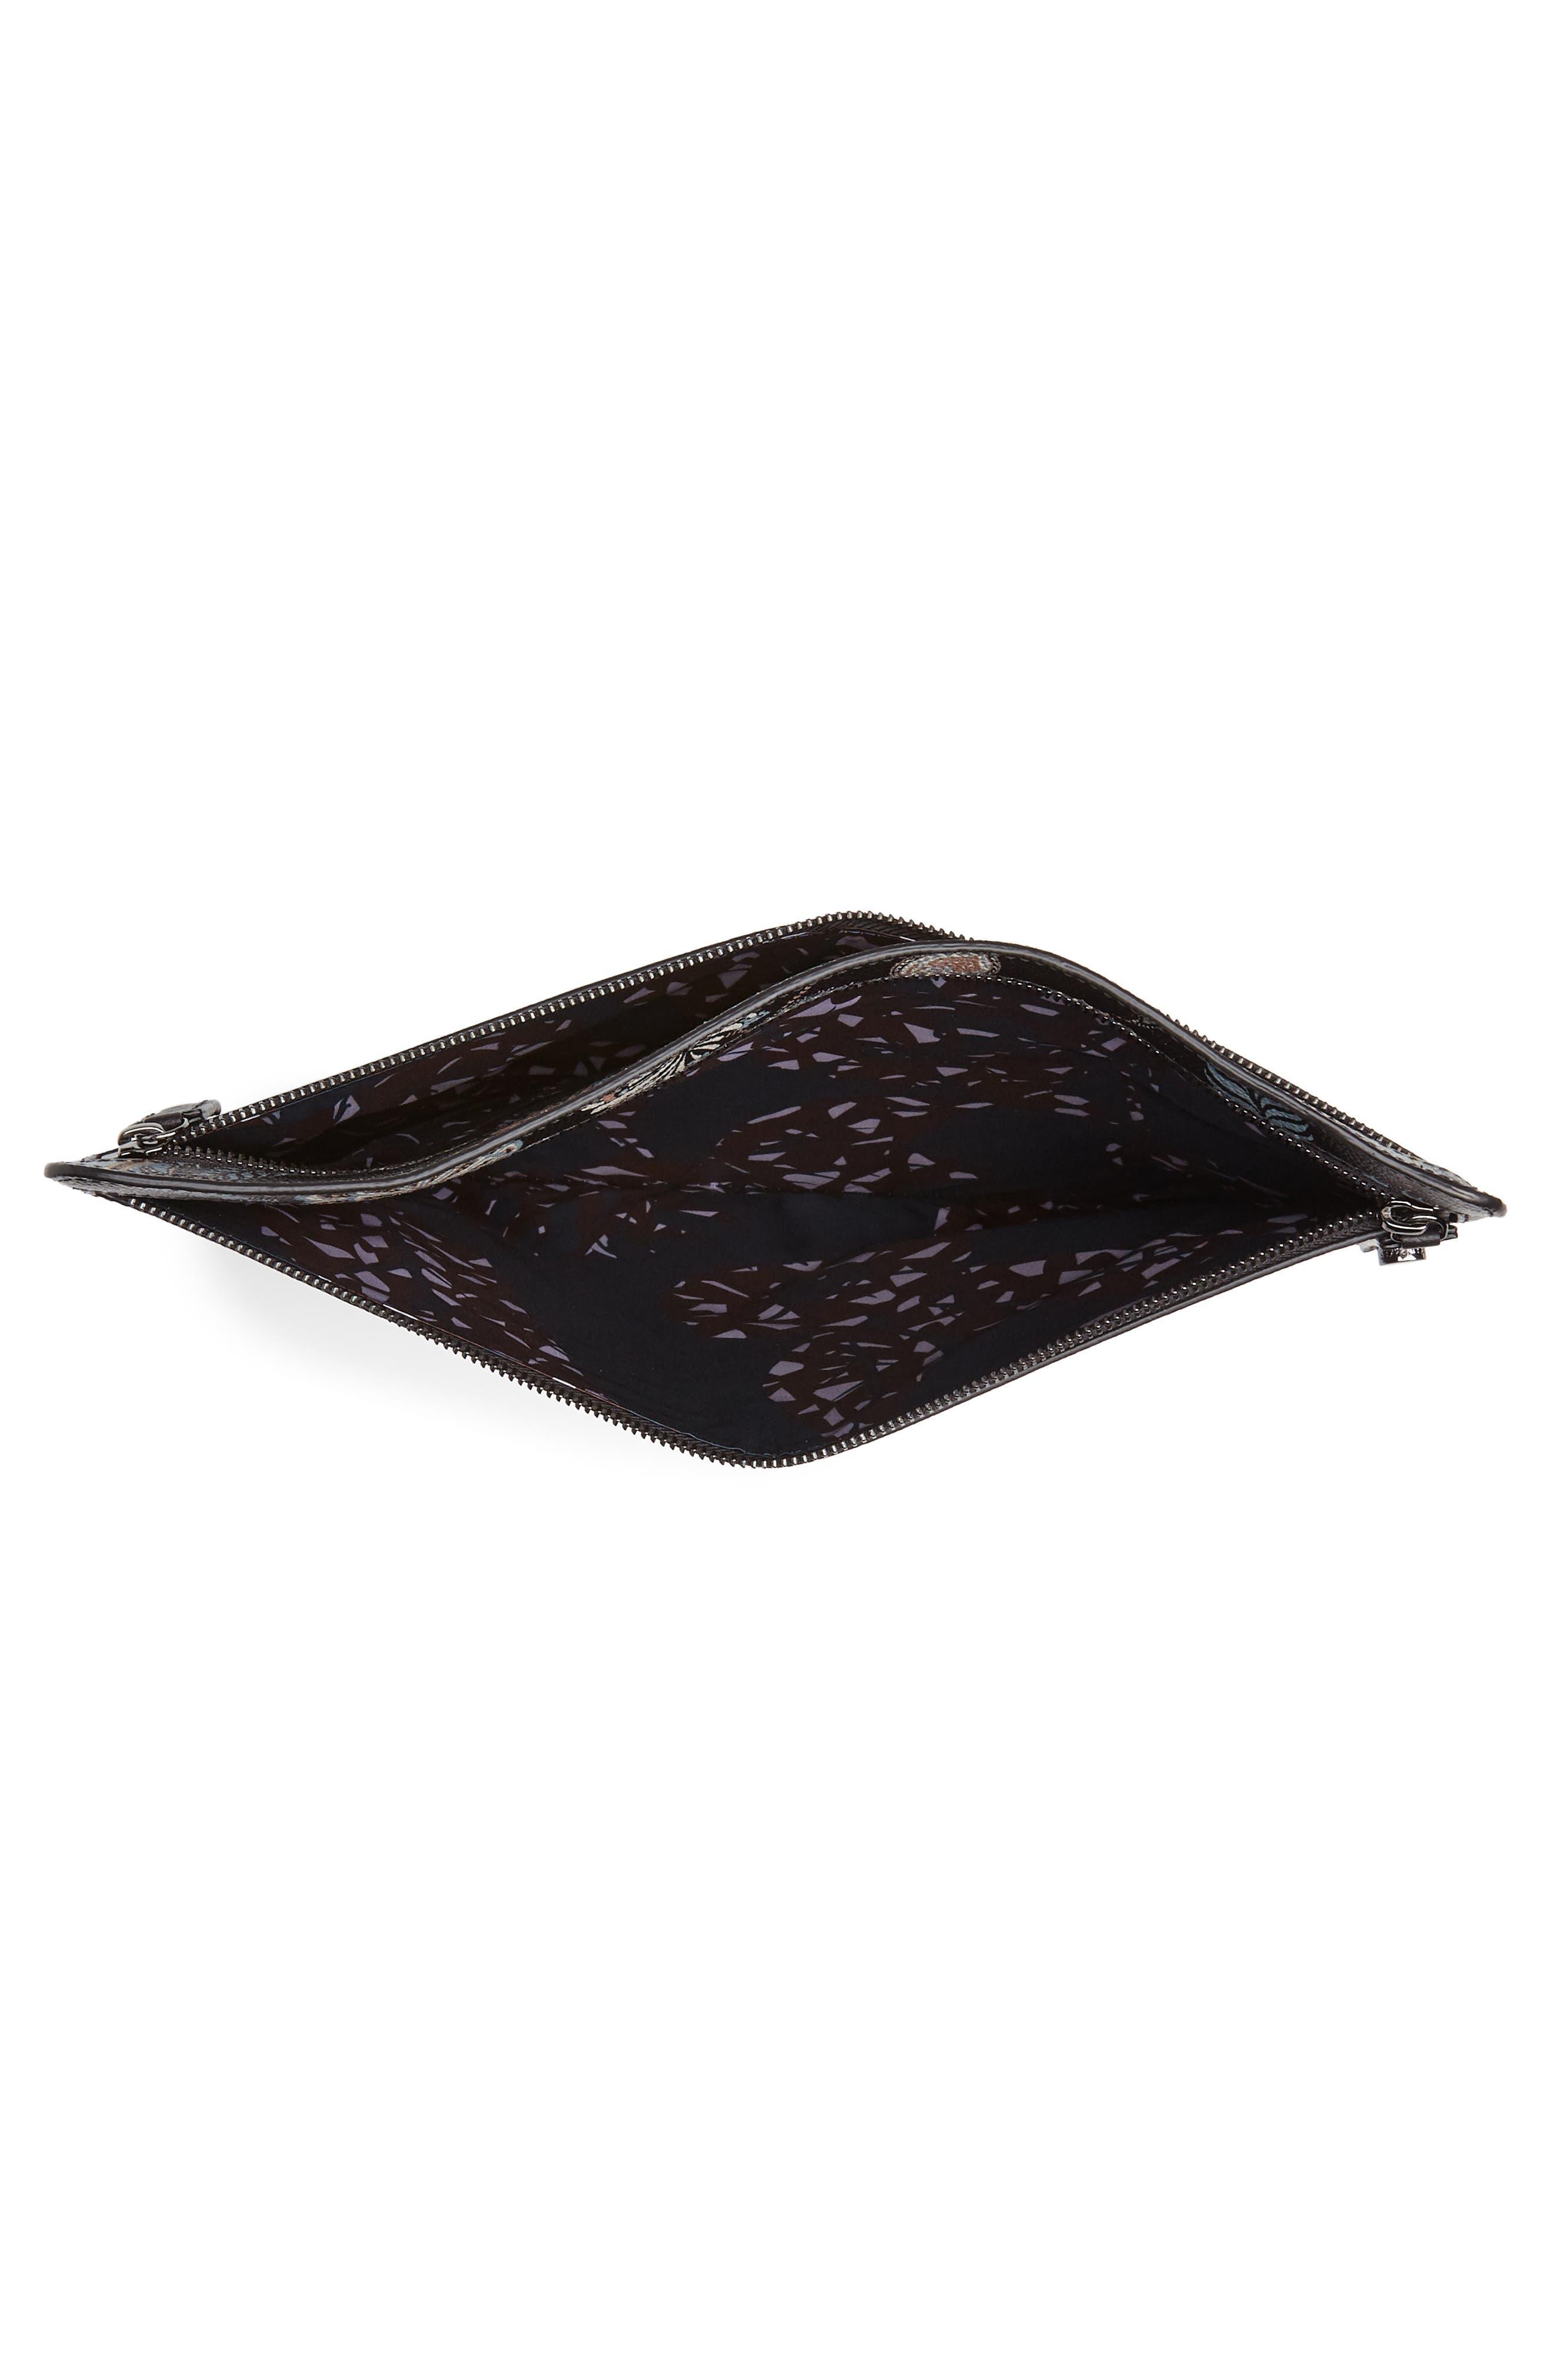 Tiggs Leather Portfolio,                             Alternate thumbnail 4, color,                             BLACK